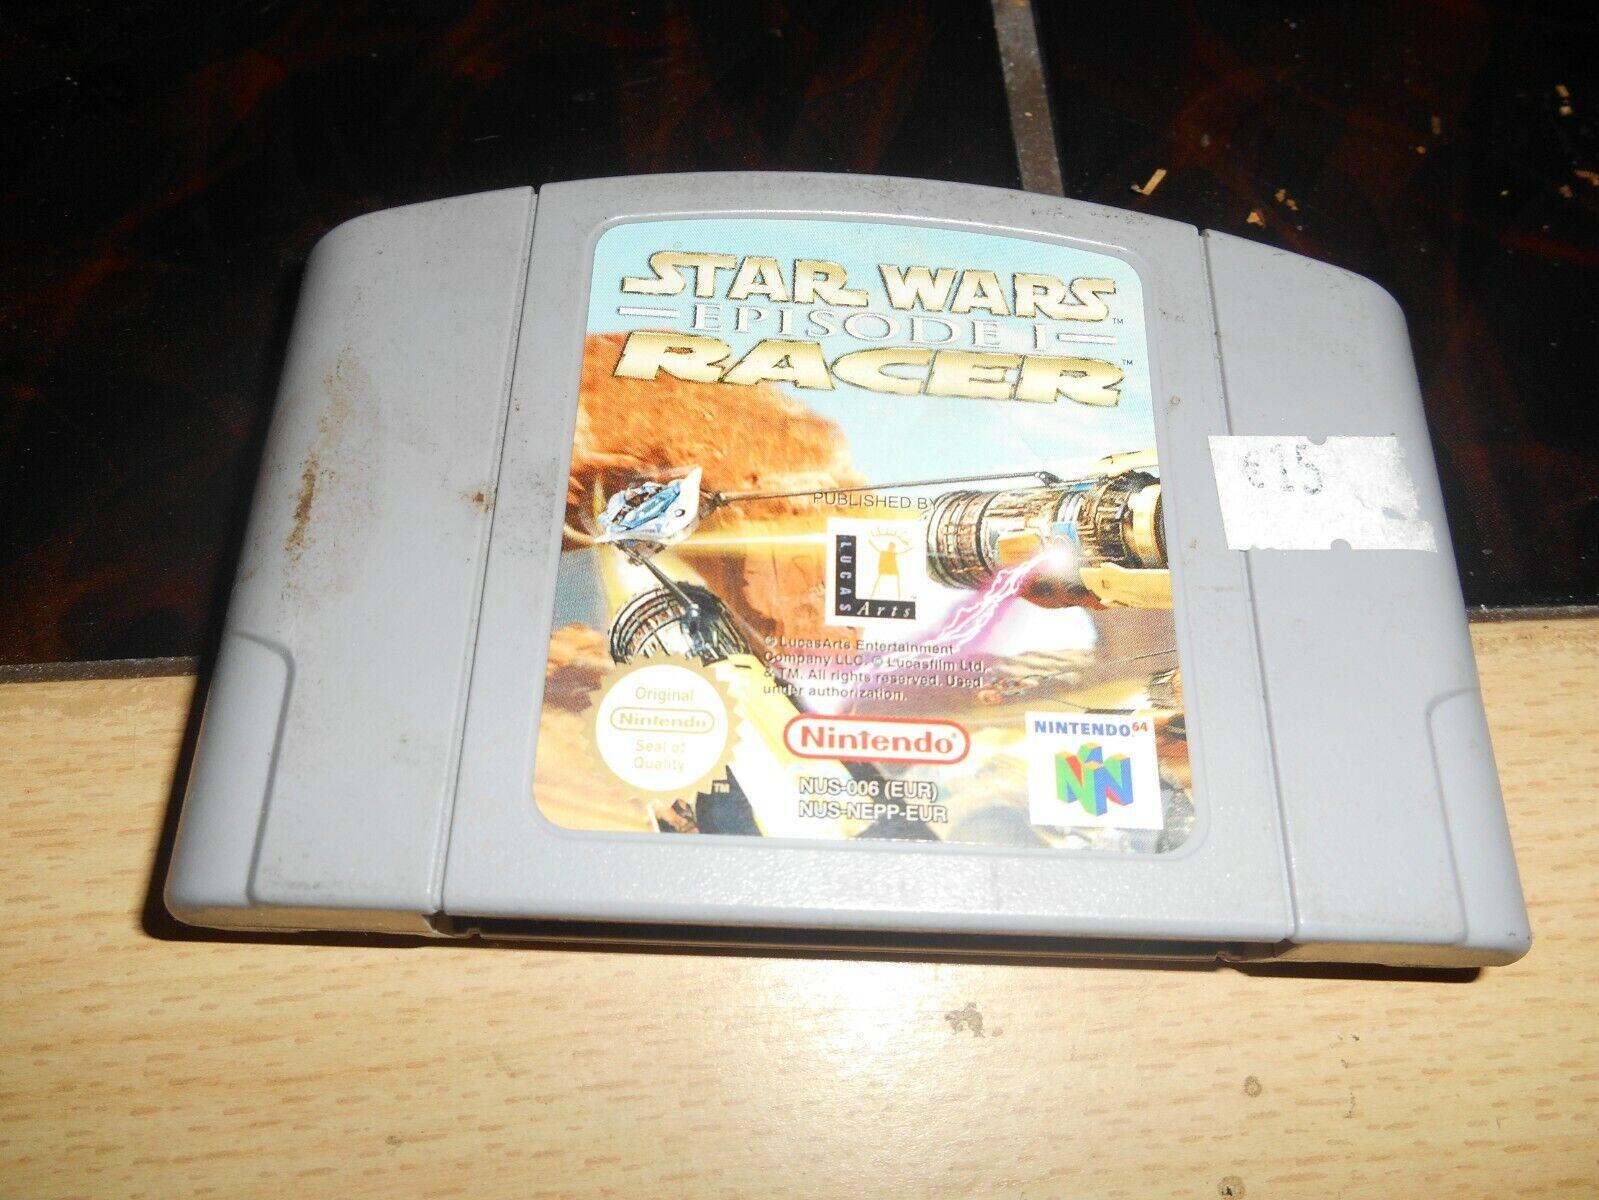 Nintendo 64 Star Wars Episode I Racer - pas cher StarWars